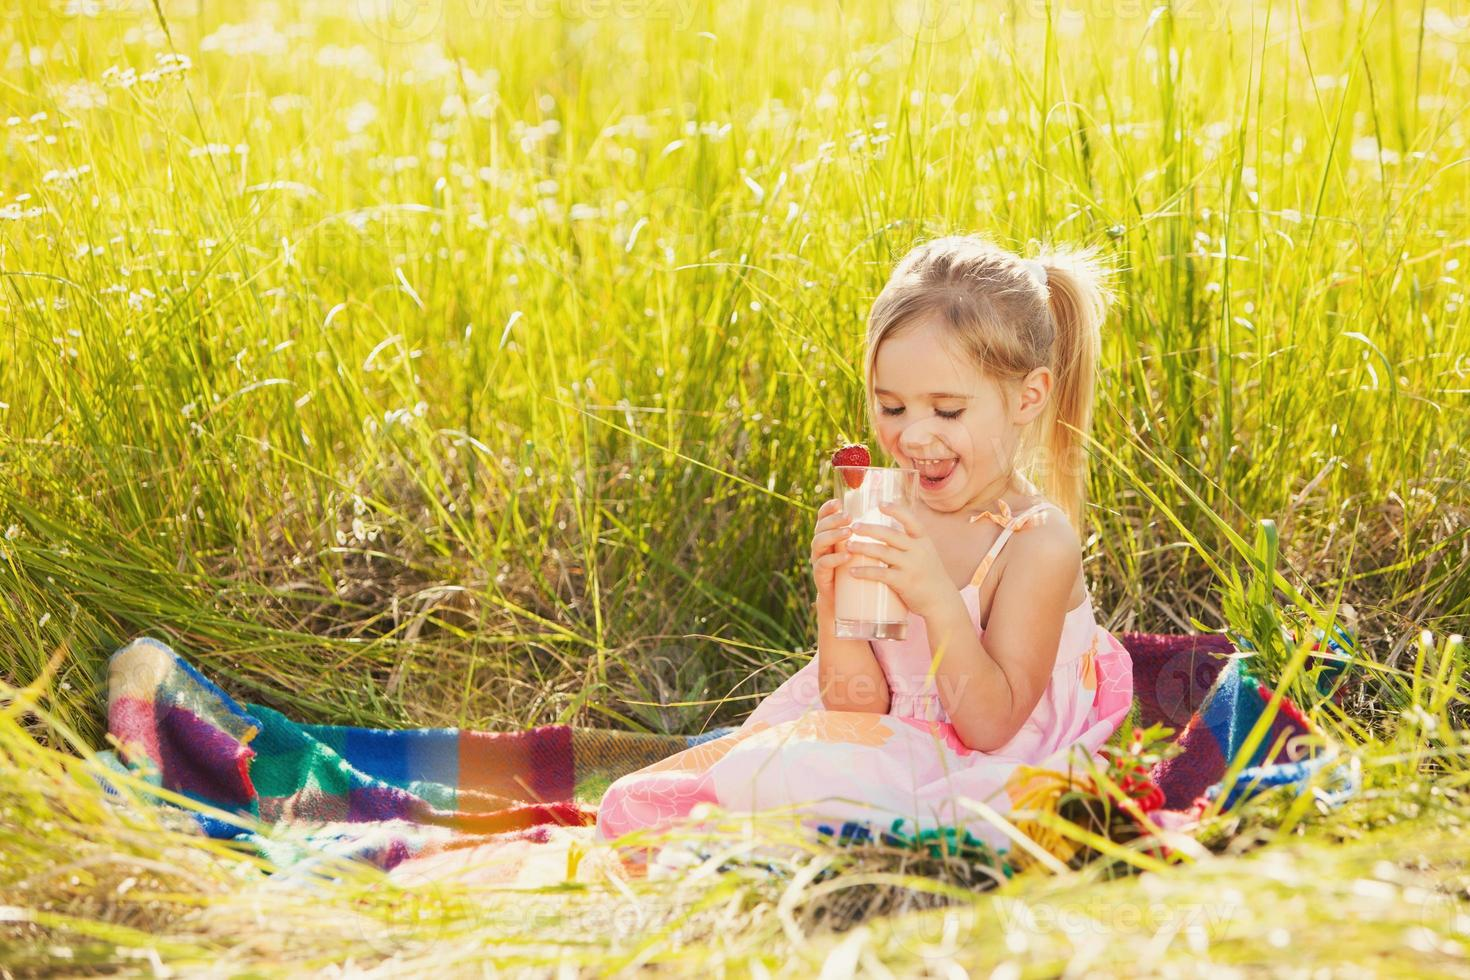 drôle, petite fille, boisson, yaourt photo